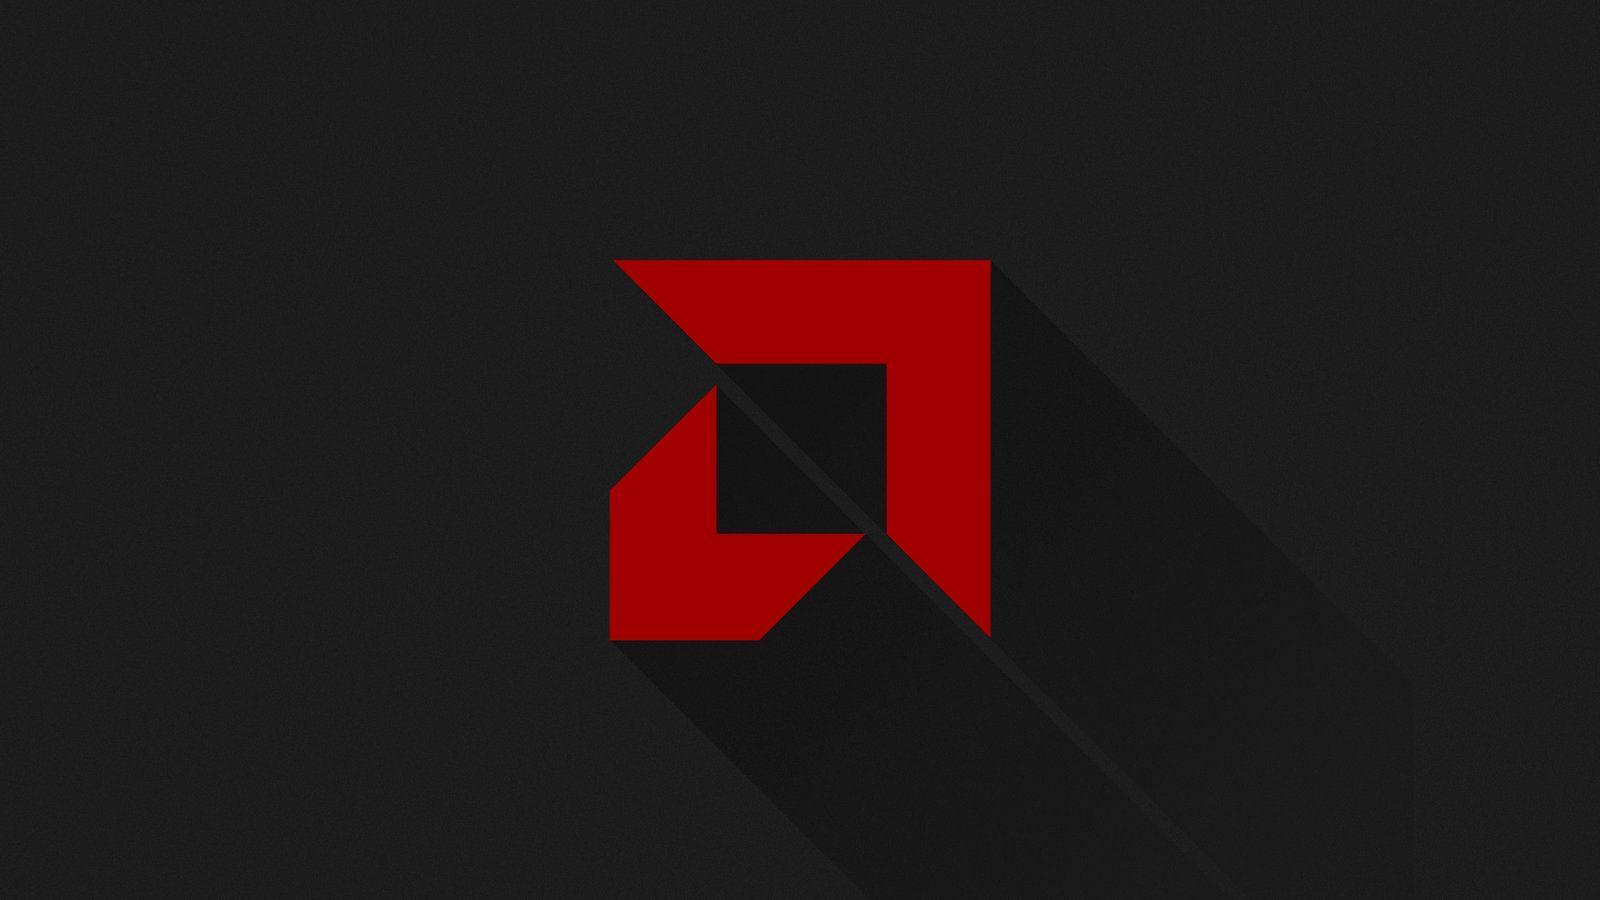 AMD 4K Wallpapers - Top Free AMD 4K Backgrounds - WallpaperAccess